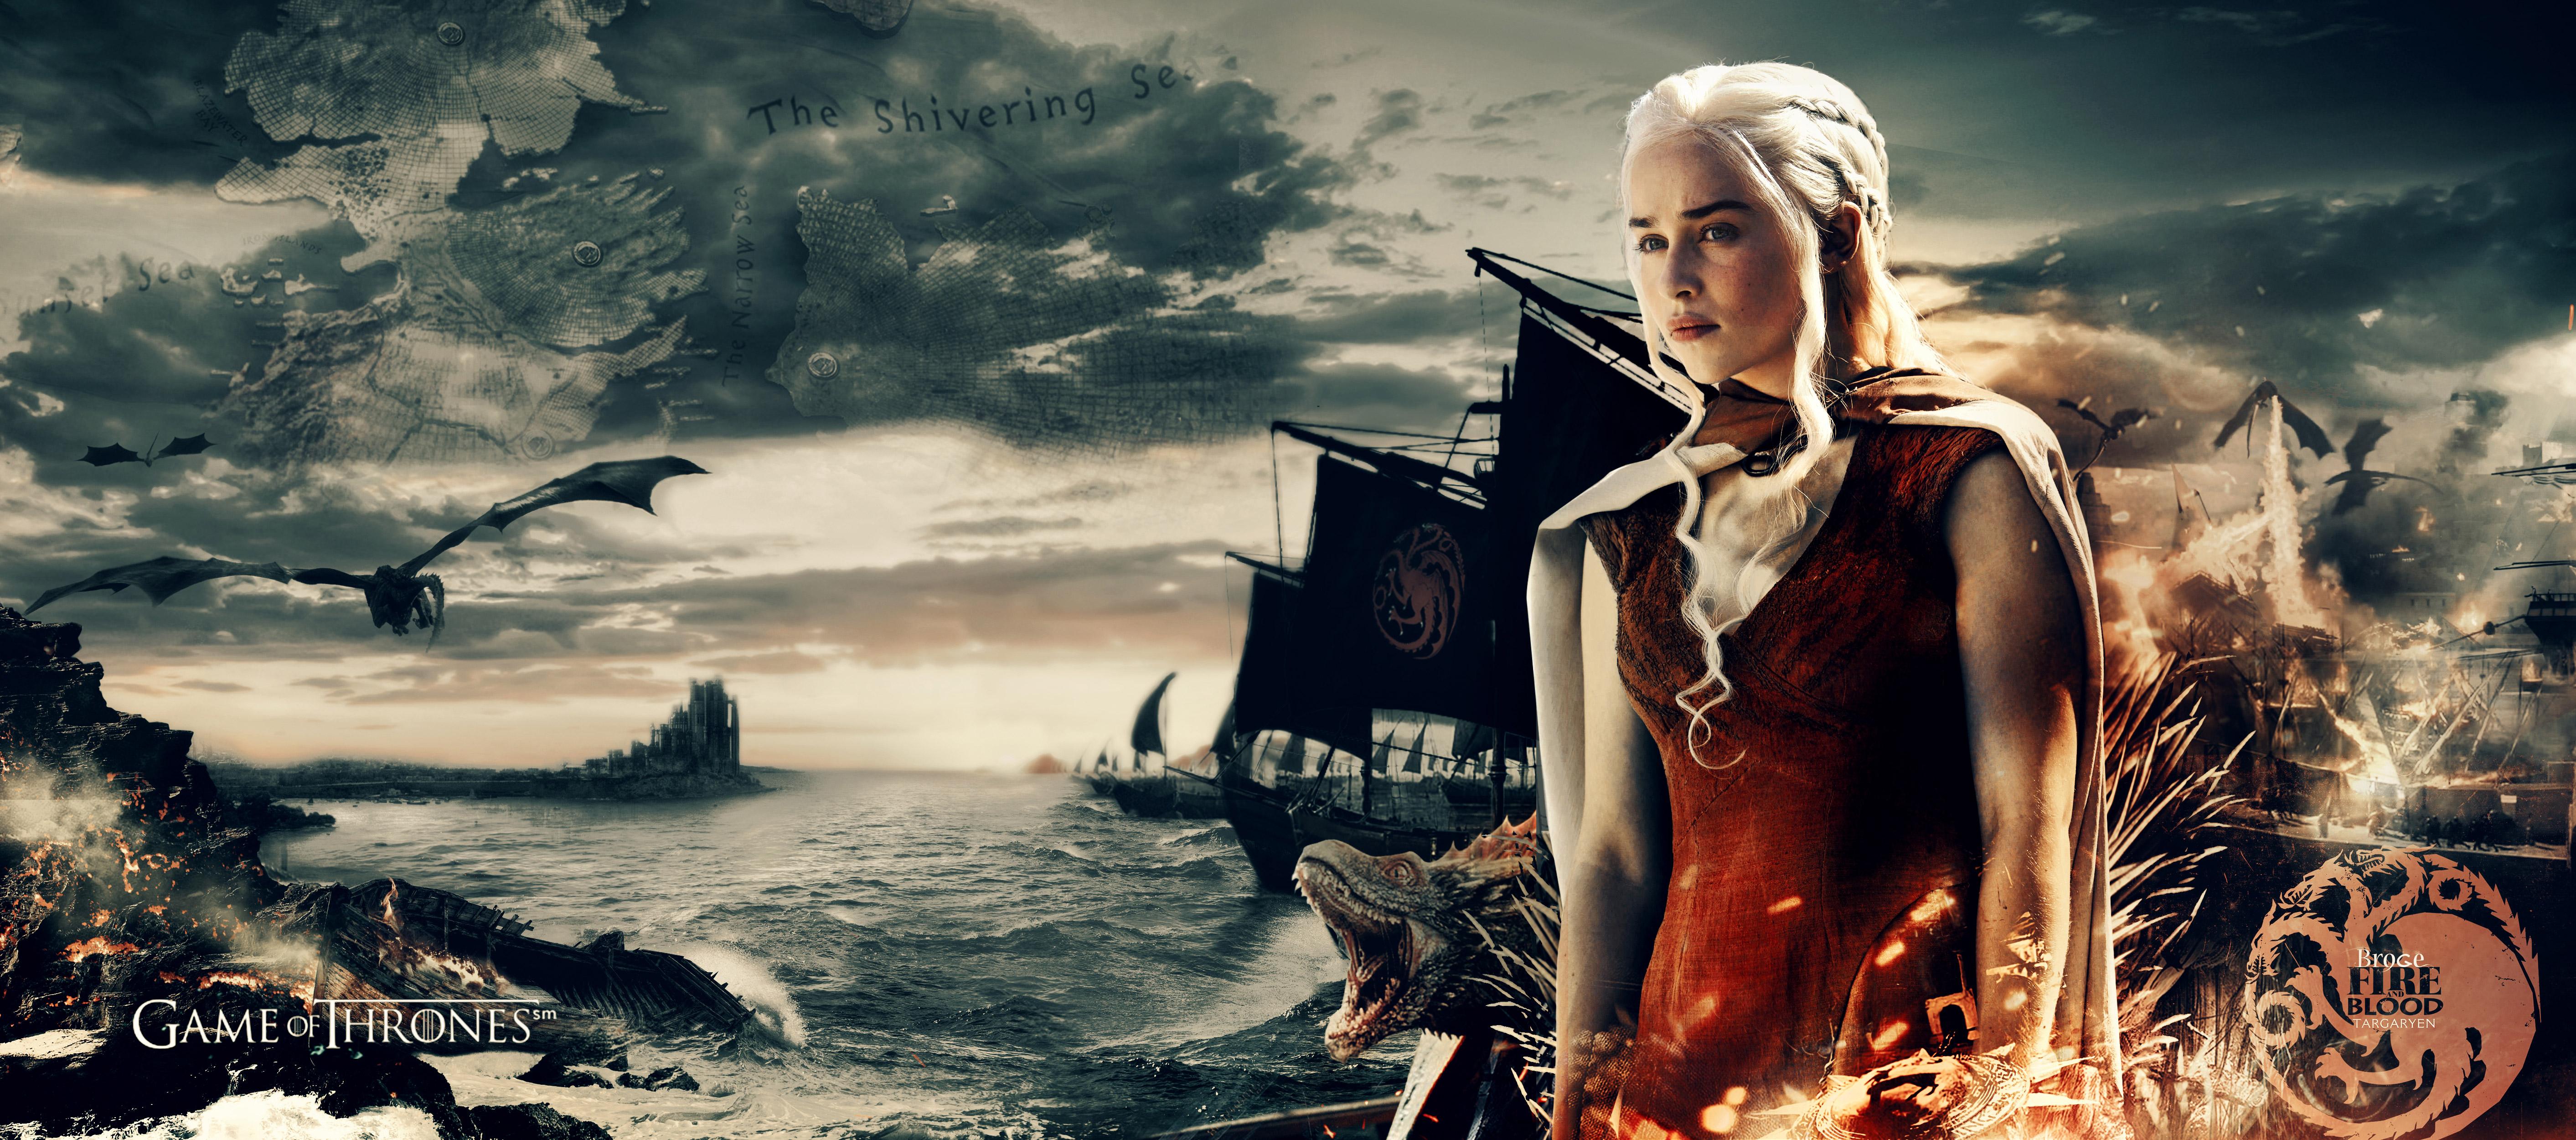 4k Game Of Thrones Wallpaper: Daenerys Targaryen 5k, HD Tv Shows, 4k Wallpapers, Images